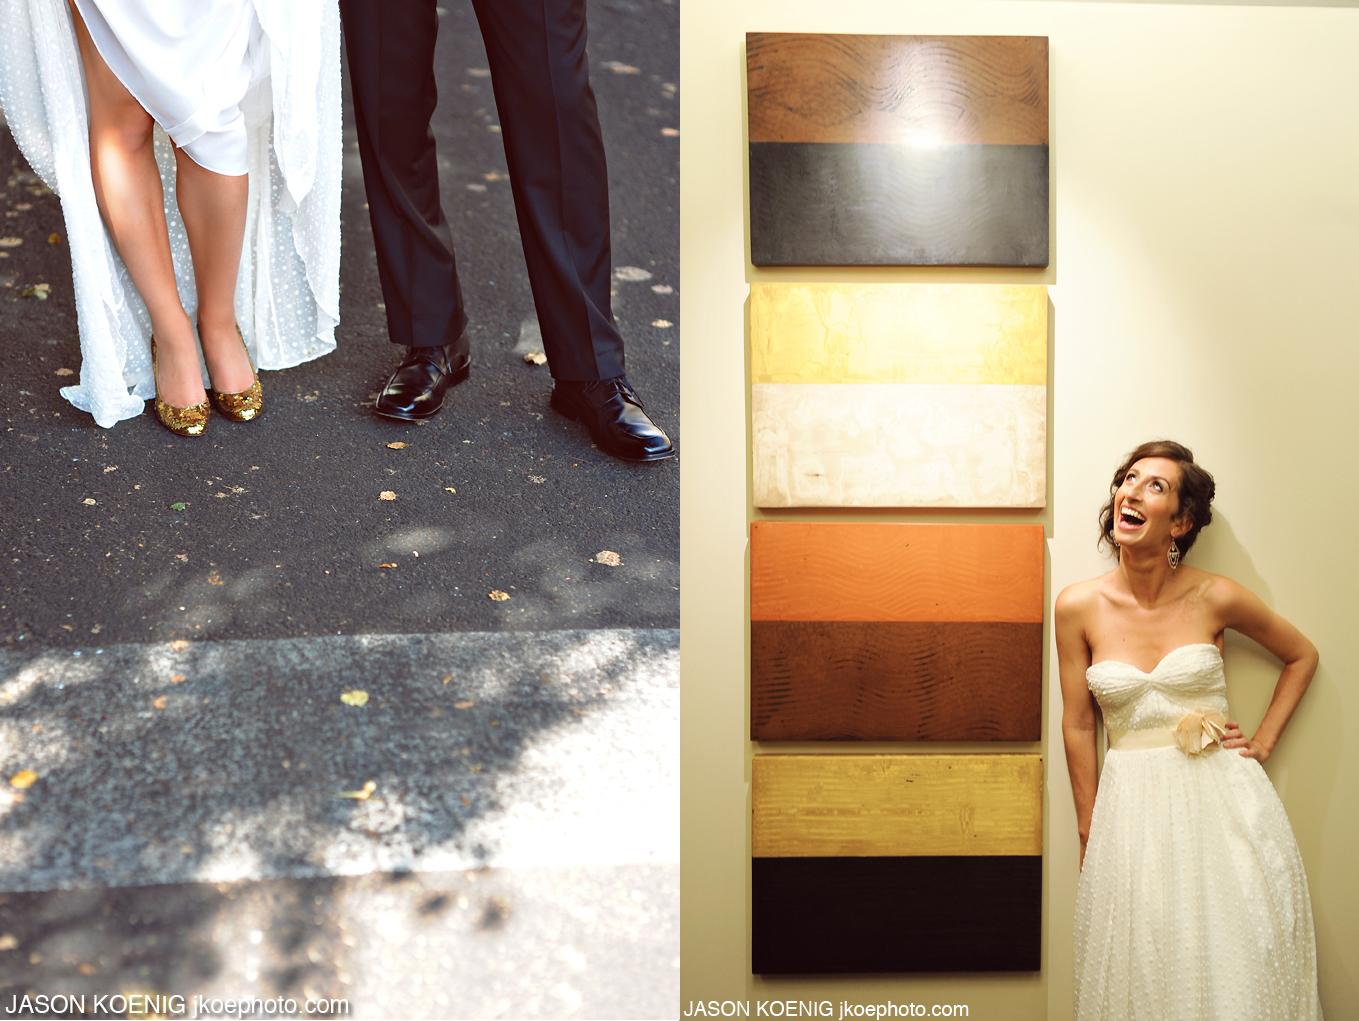 jkoe photography Meghan & Joe Downtown Seattle Wedding  (17).jpg